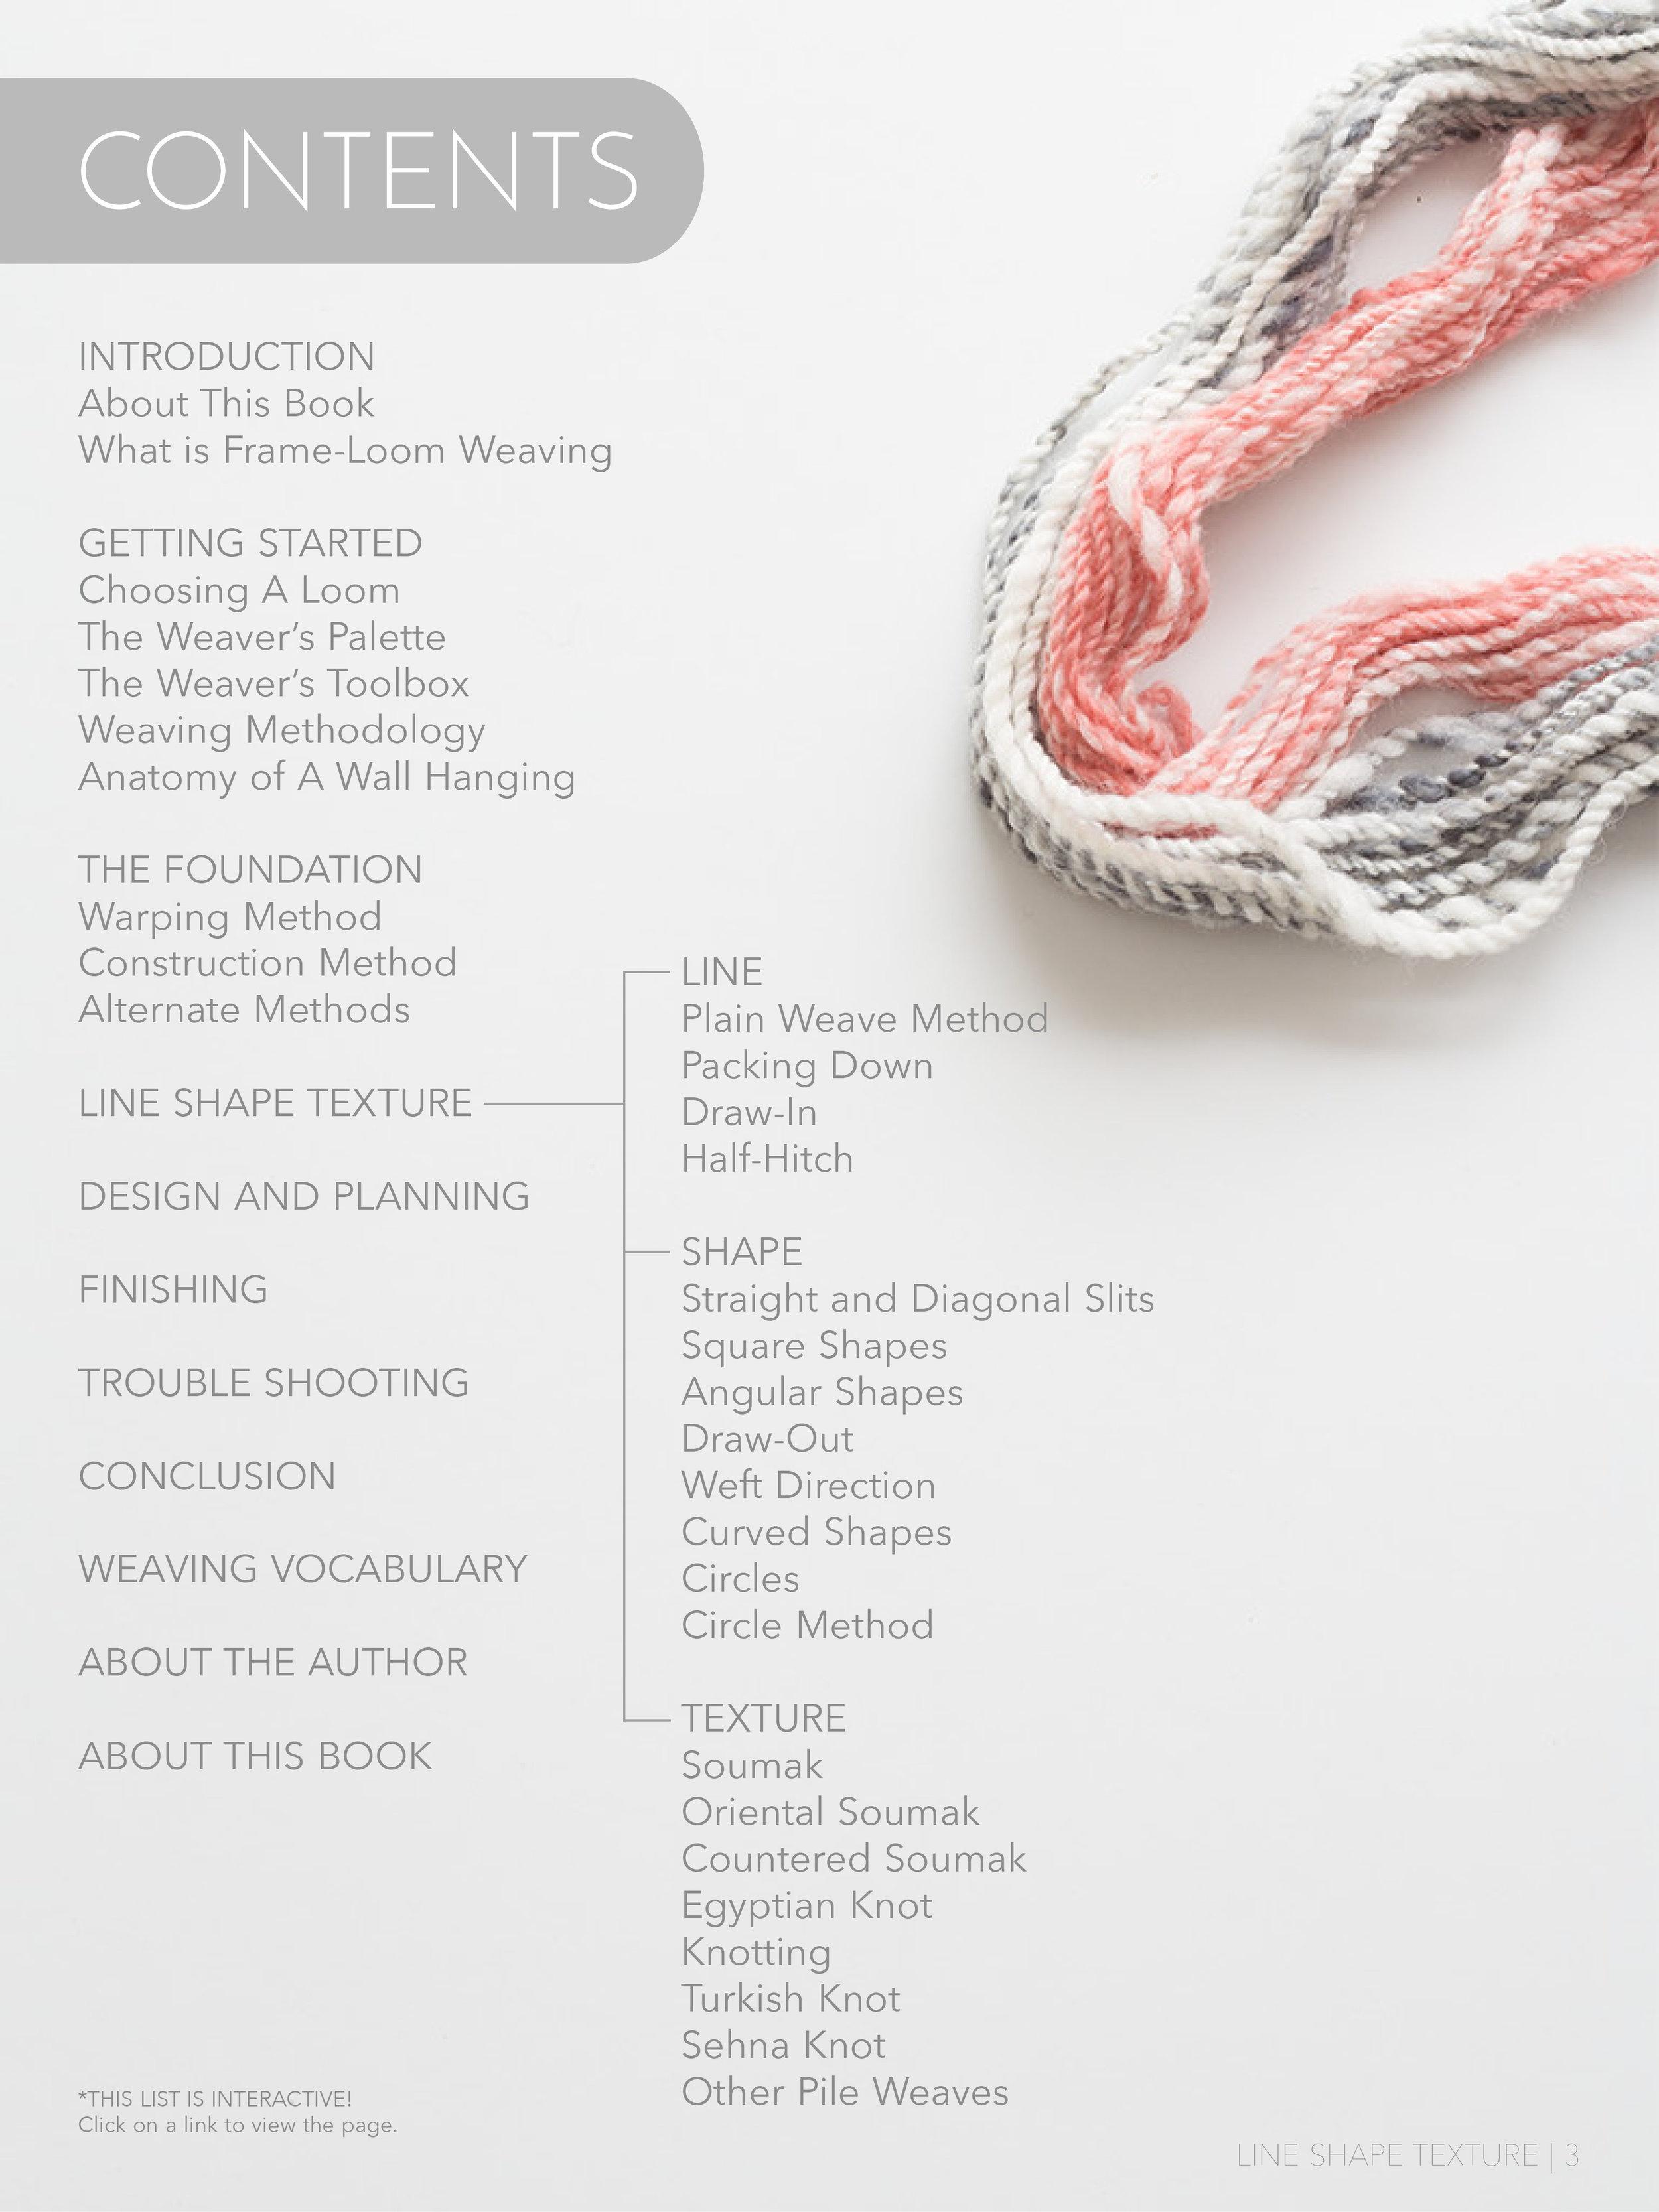 LINE SHAPE TEXTURE A Creative's Guide to Frame-Loom Weaving2.jpg